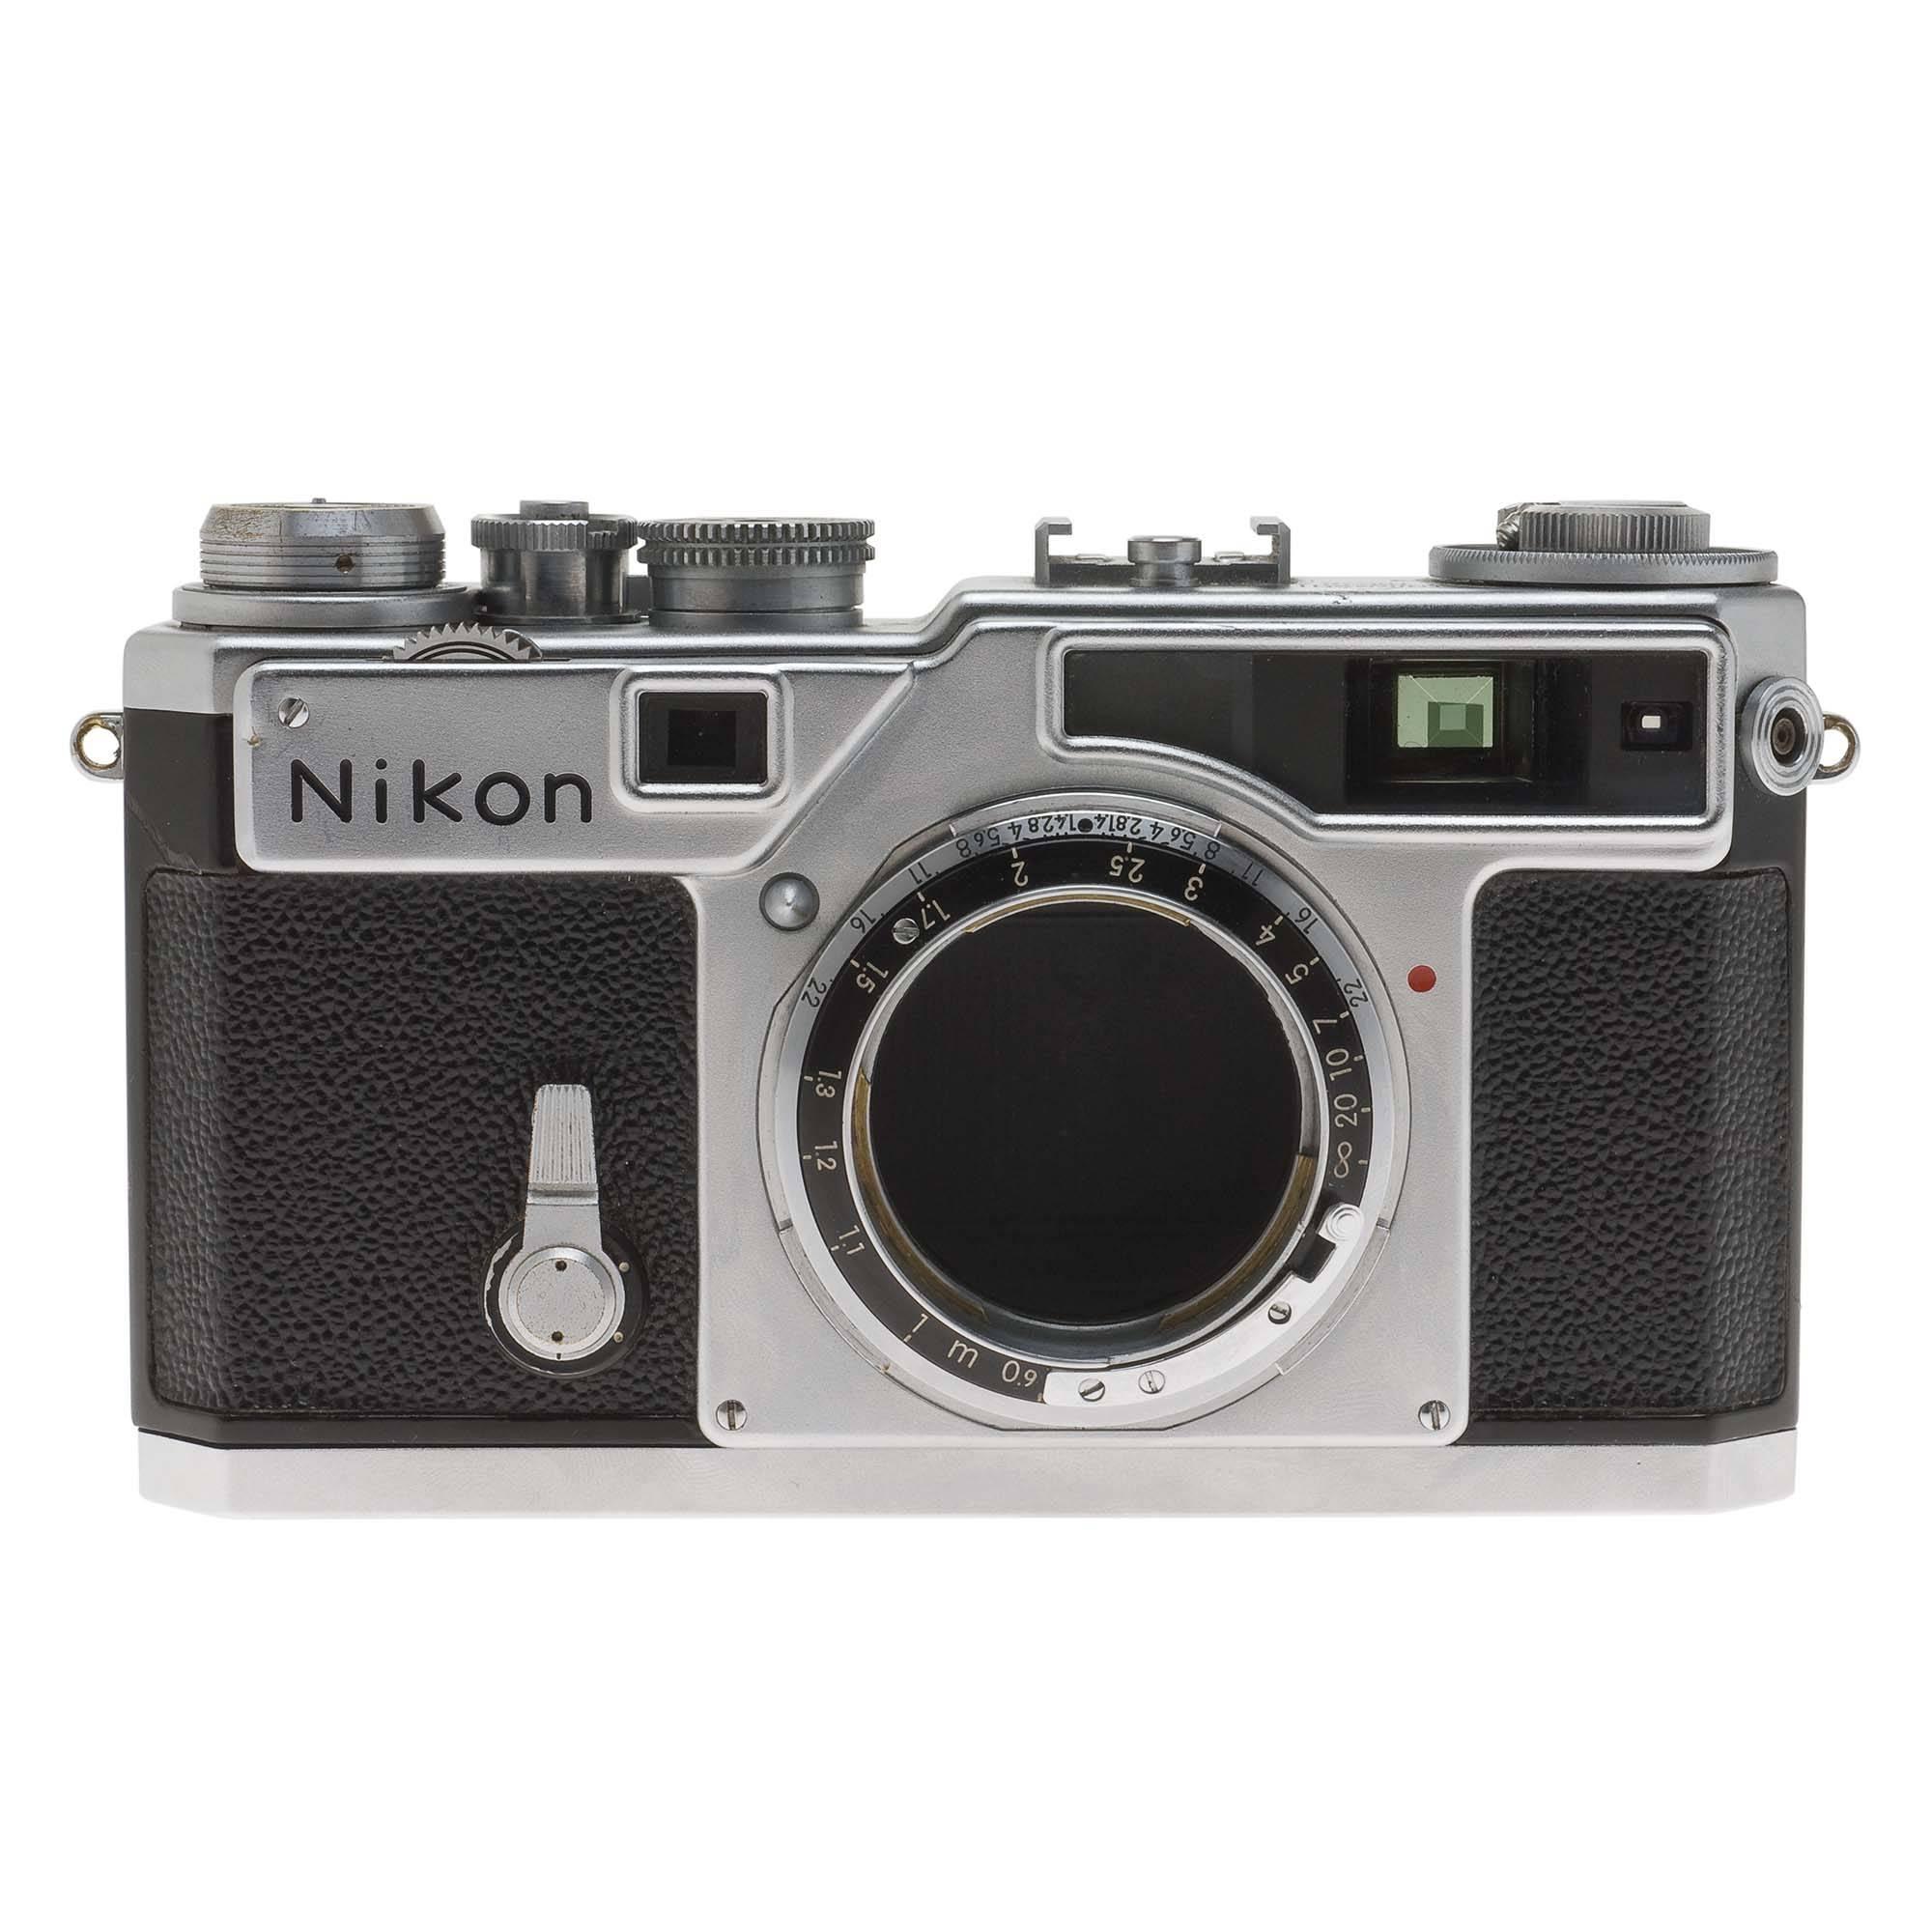 used nikon sp 35mm rangefinder manual focus camera body chrome rh bhphotovideo com Nikon ProStaff Rangefinder Nikon Digital Rangefinder